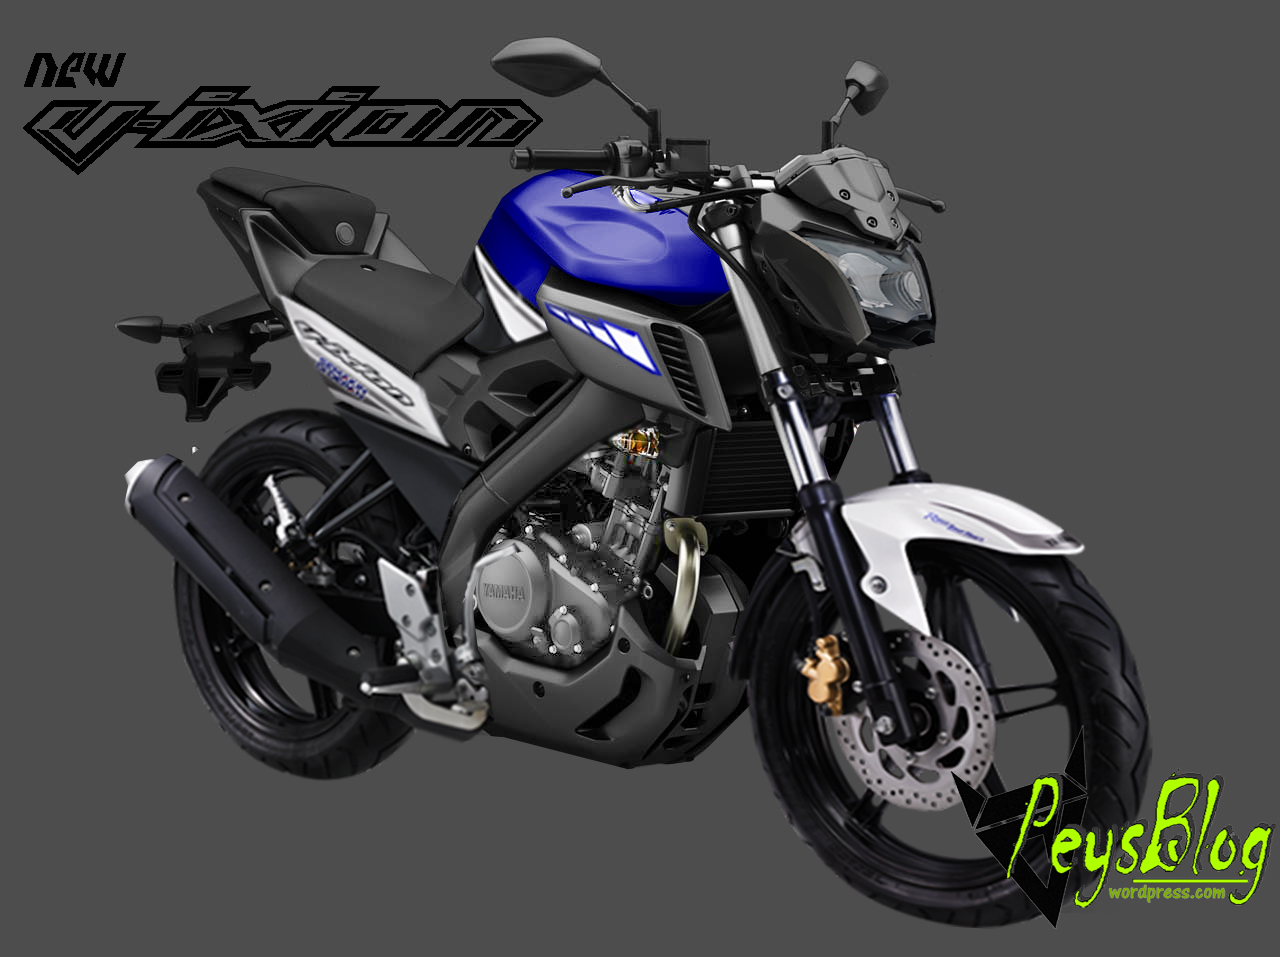 94 Modifikasi Motor Vixion Facelift Terkeren Kinyis Motor